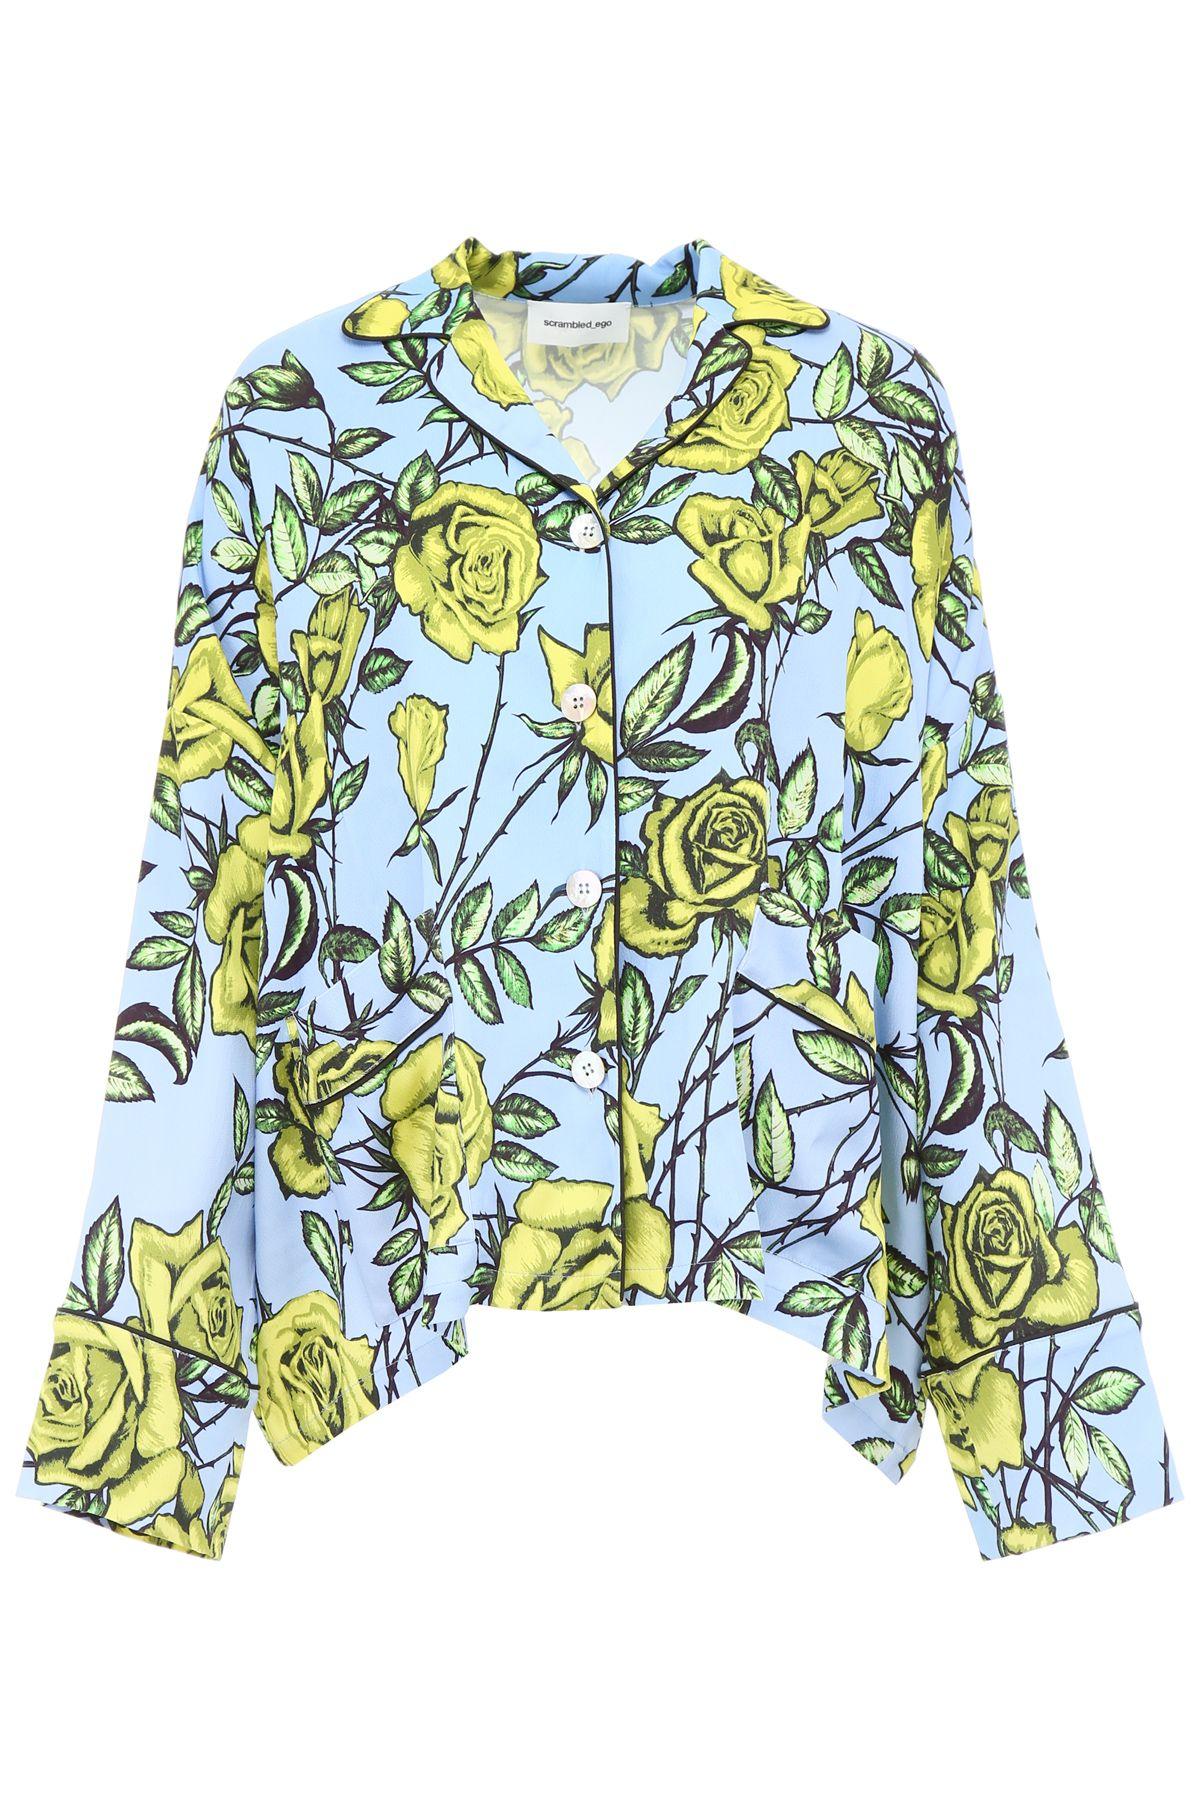 SCRAMBLED EGO Pyjama Shirt With Roses Print in Light Blue Lemon